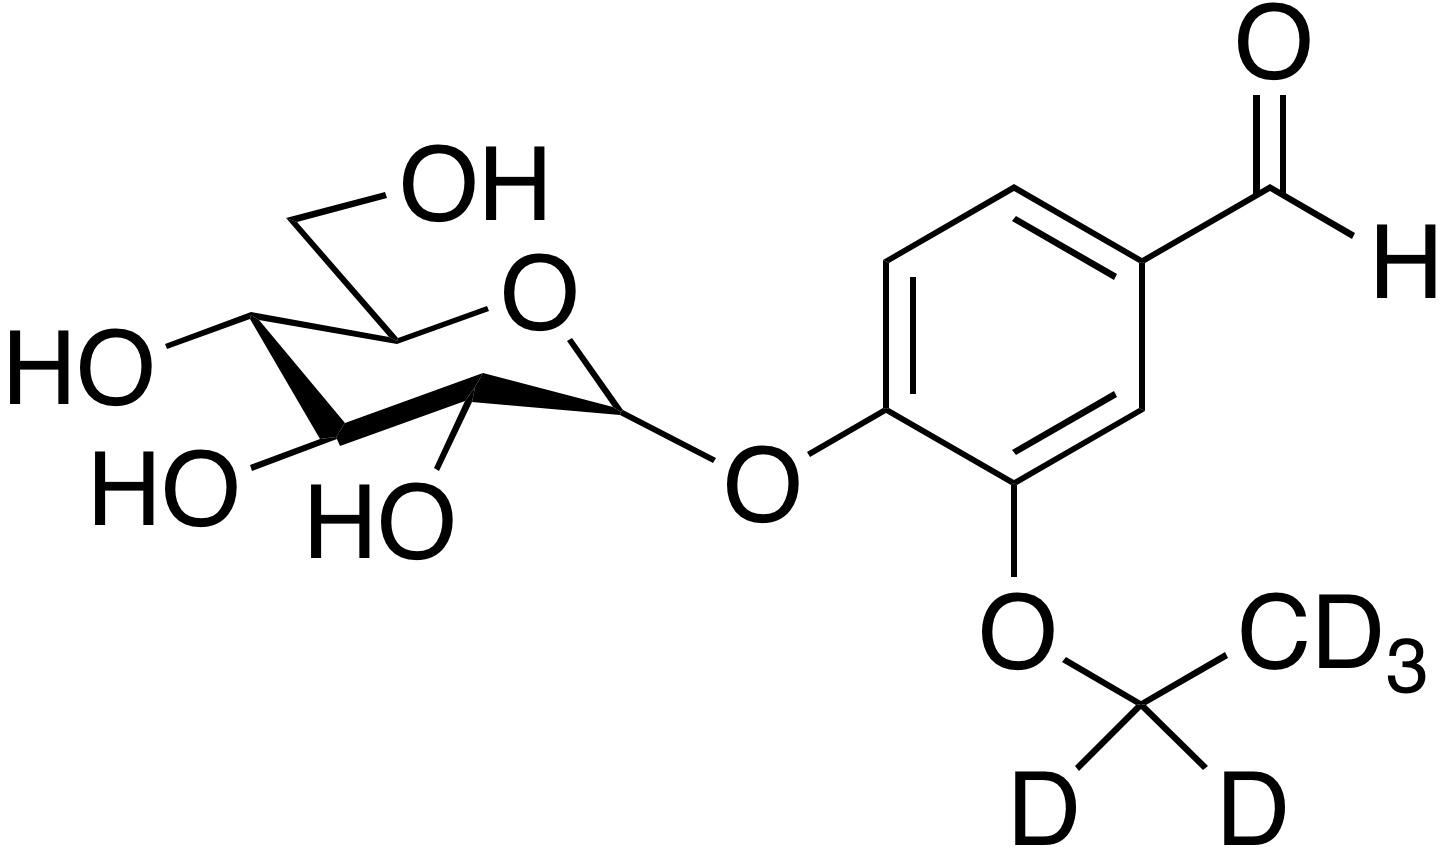 Ethyl-d<sub>5</sub> vanillin glucoside